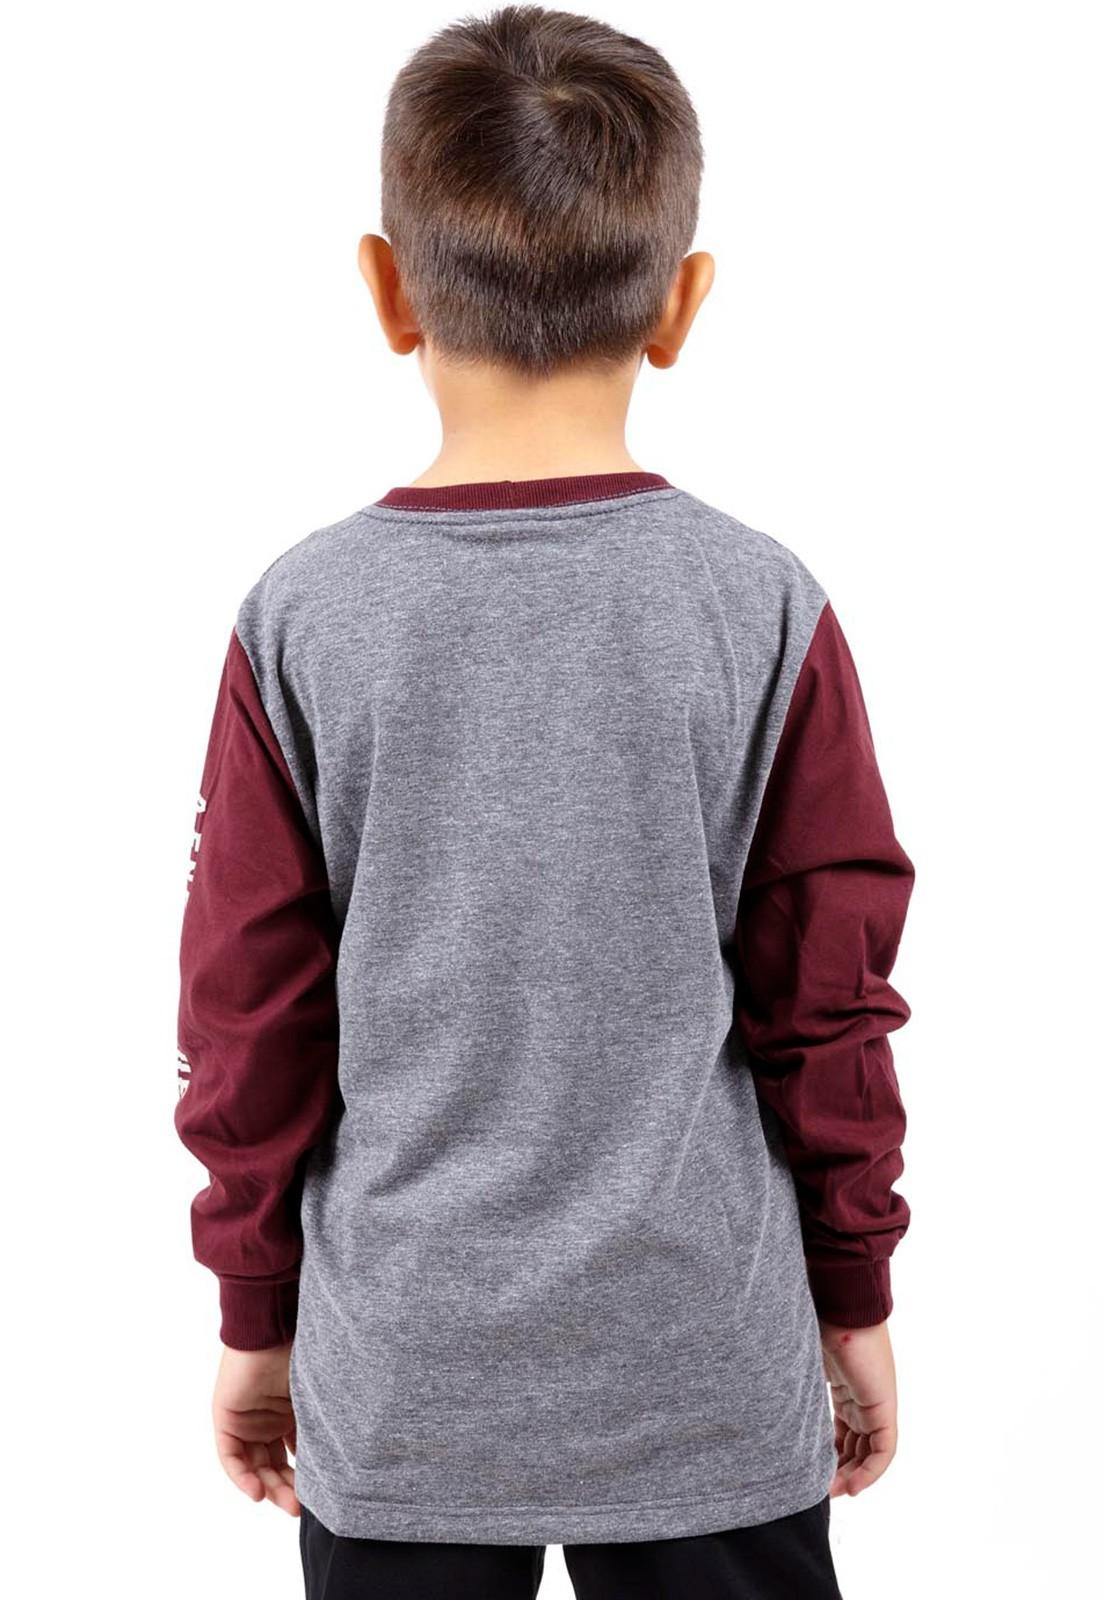 Camiseta Vida Marinha Manga Longa Cinza/Bordô